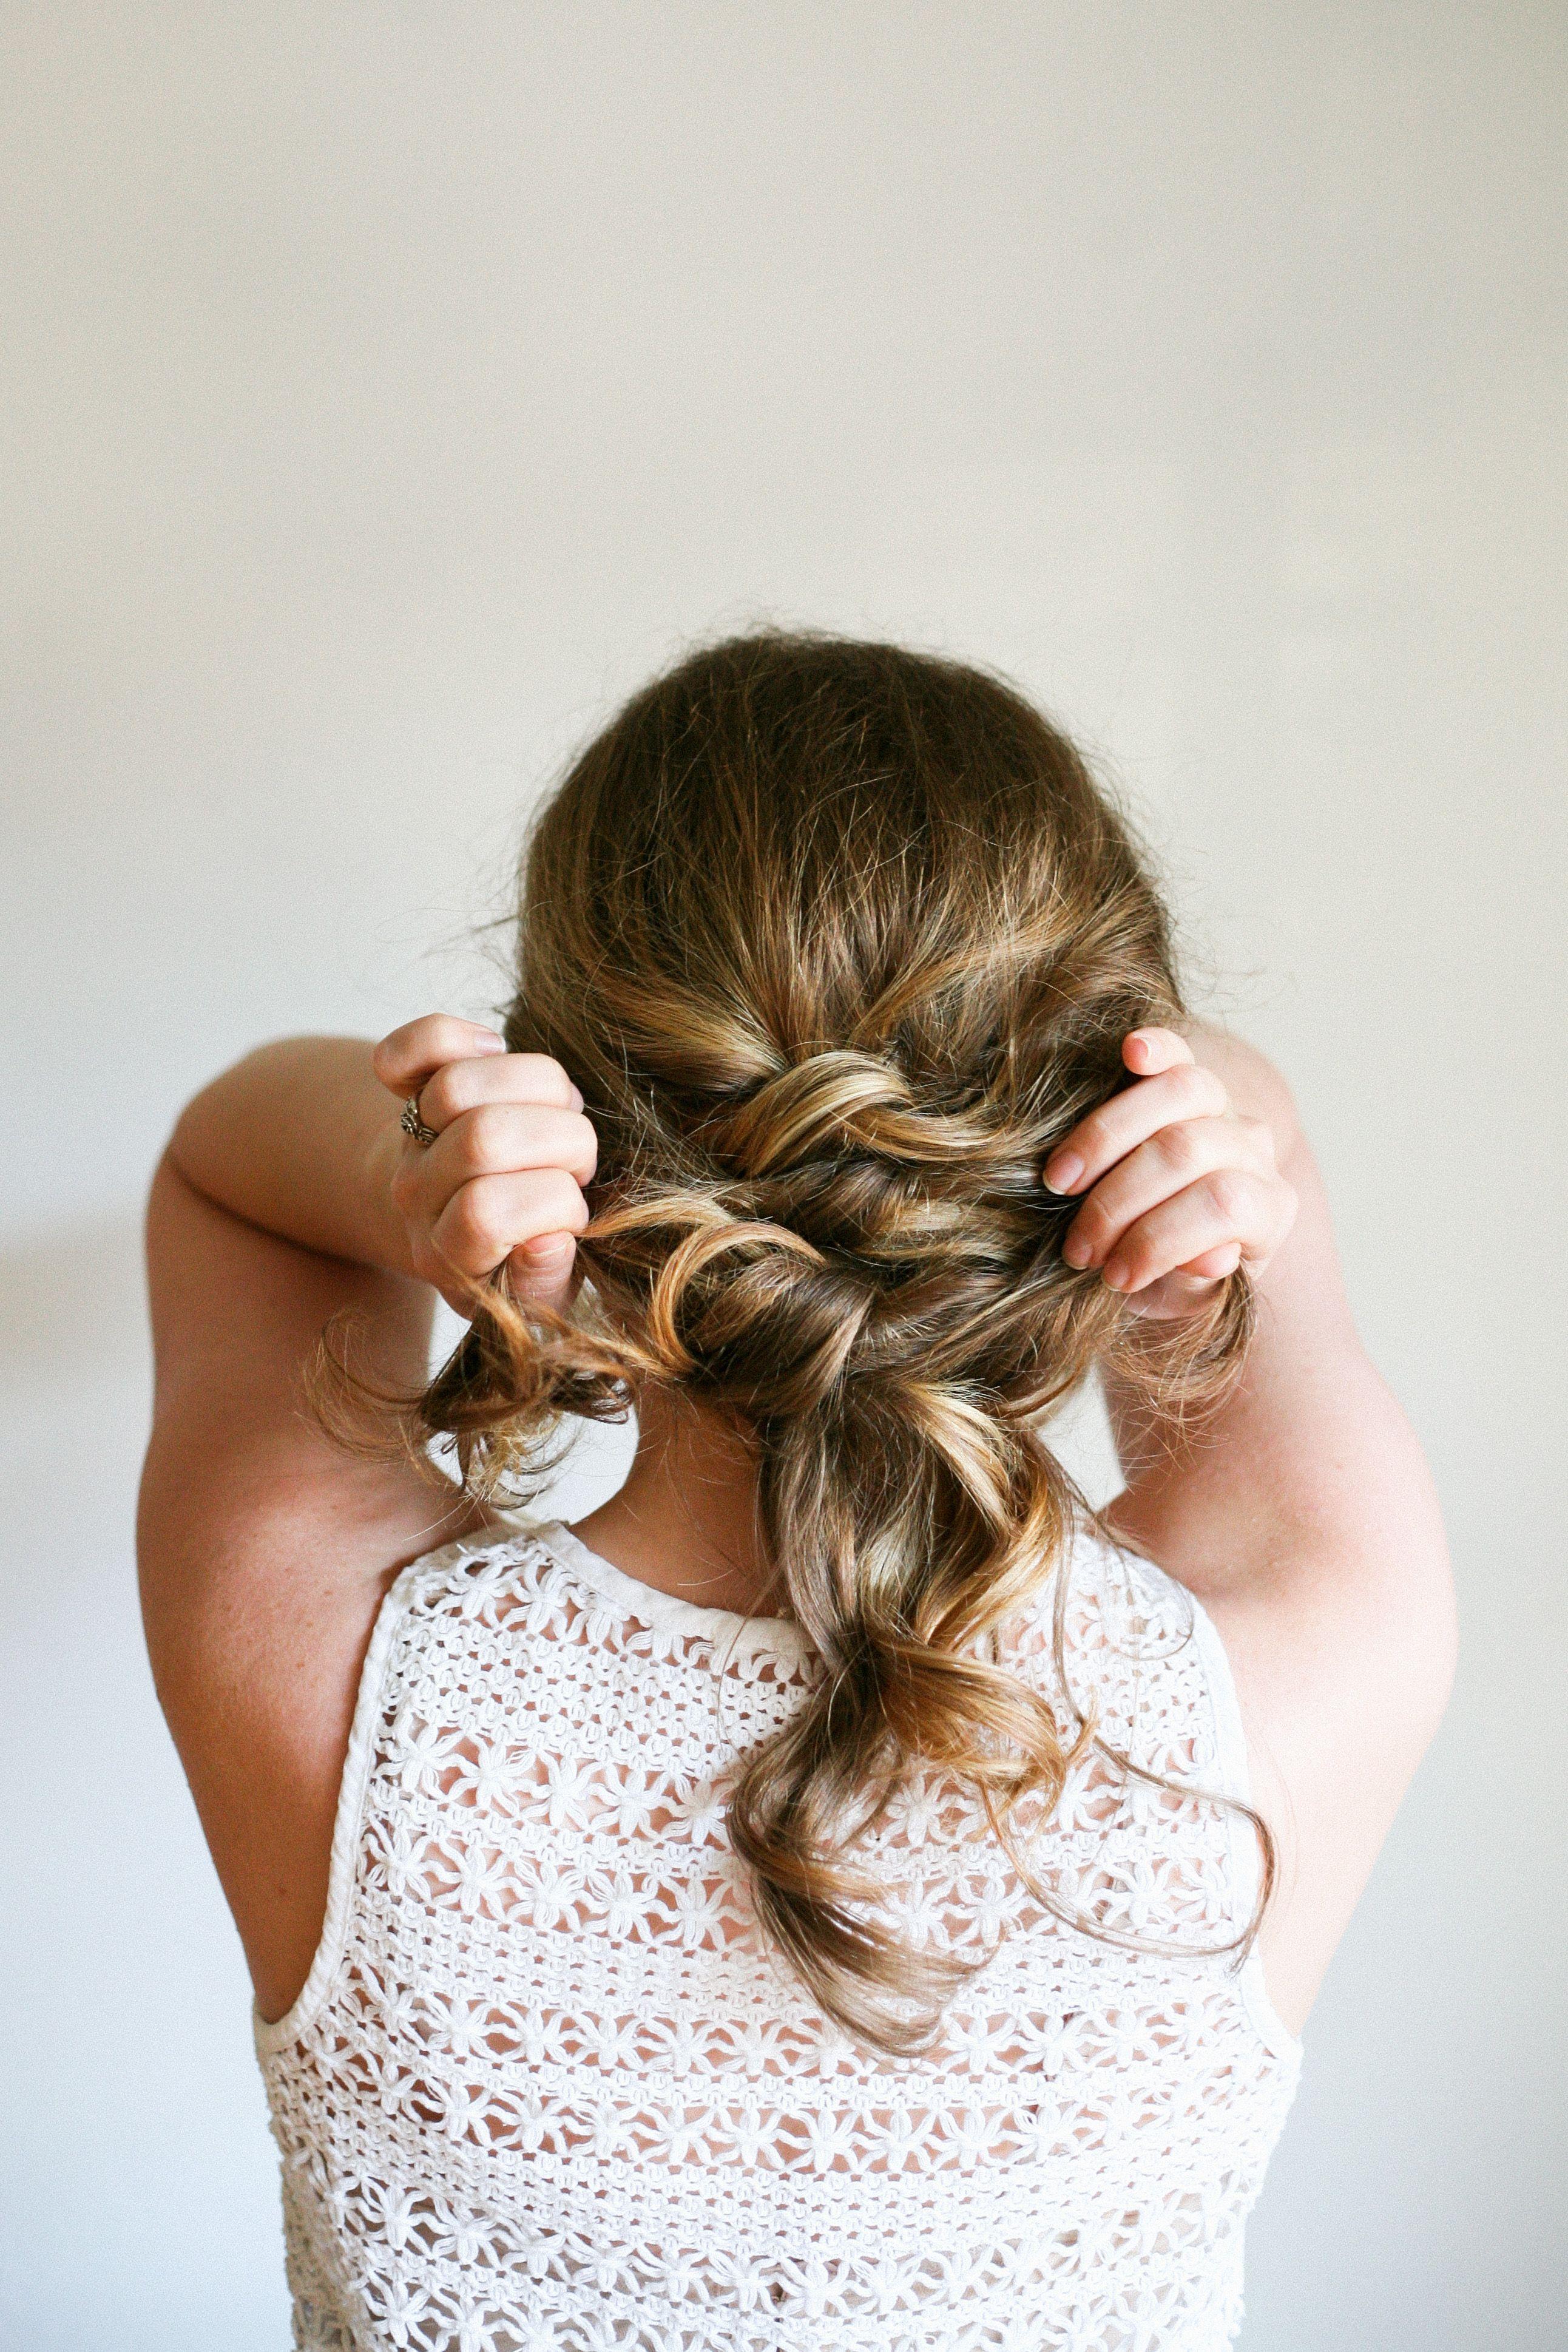 Tuto Coiffure Summer Tuto Coiffure Beaux Cheveux Coiffure